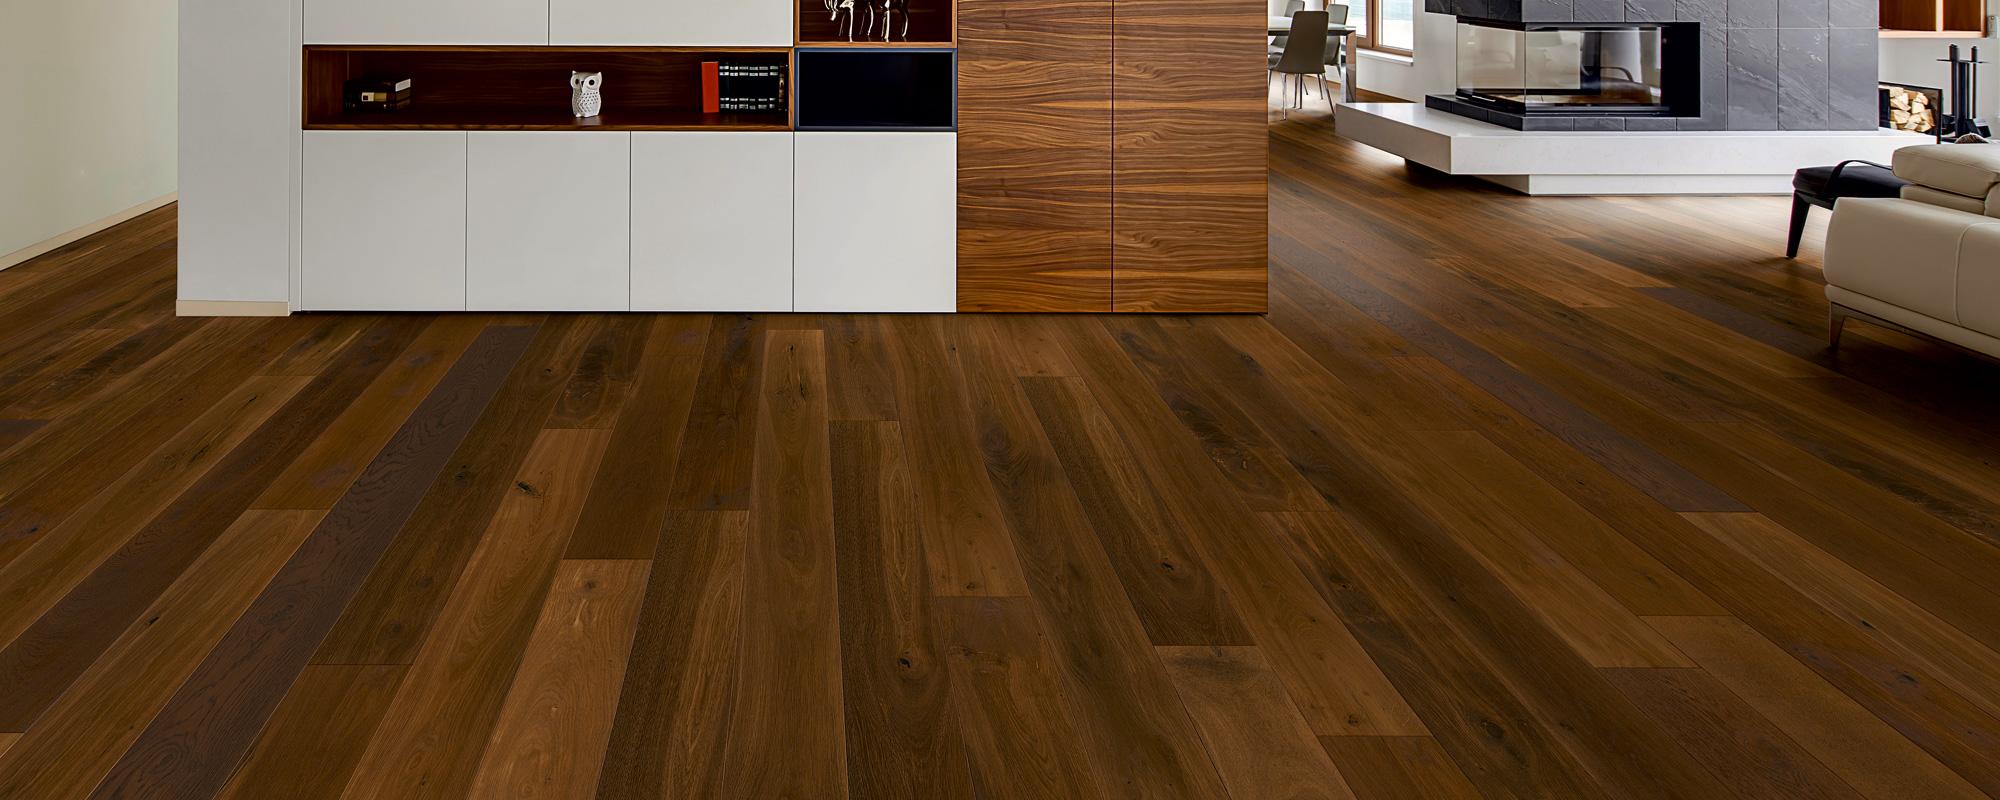 Variation Serie Design Räuchereiche Variation Rustikal Style Flooring Parkett Dielen Köln